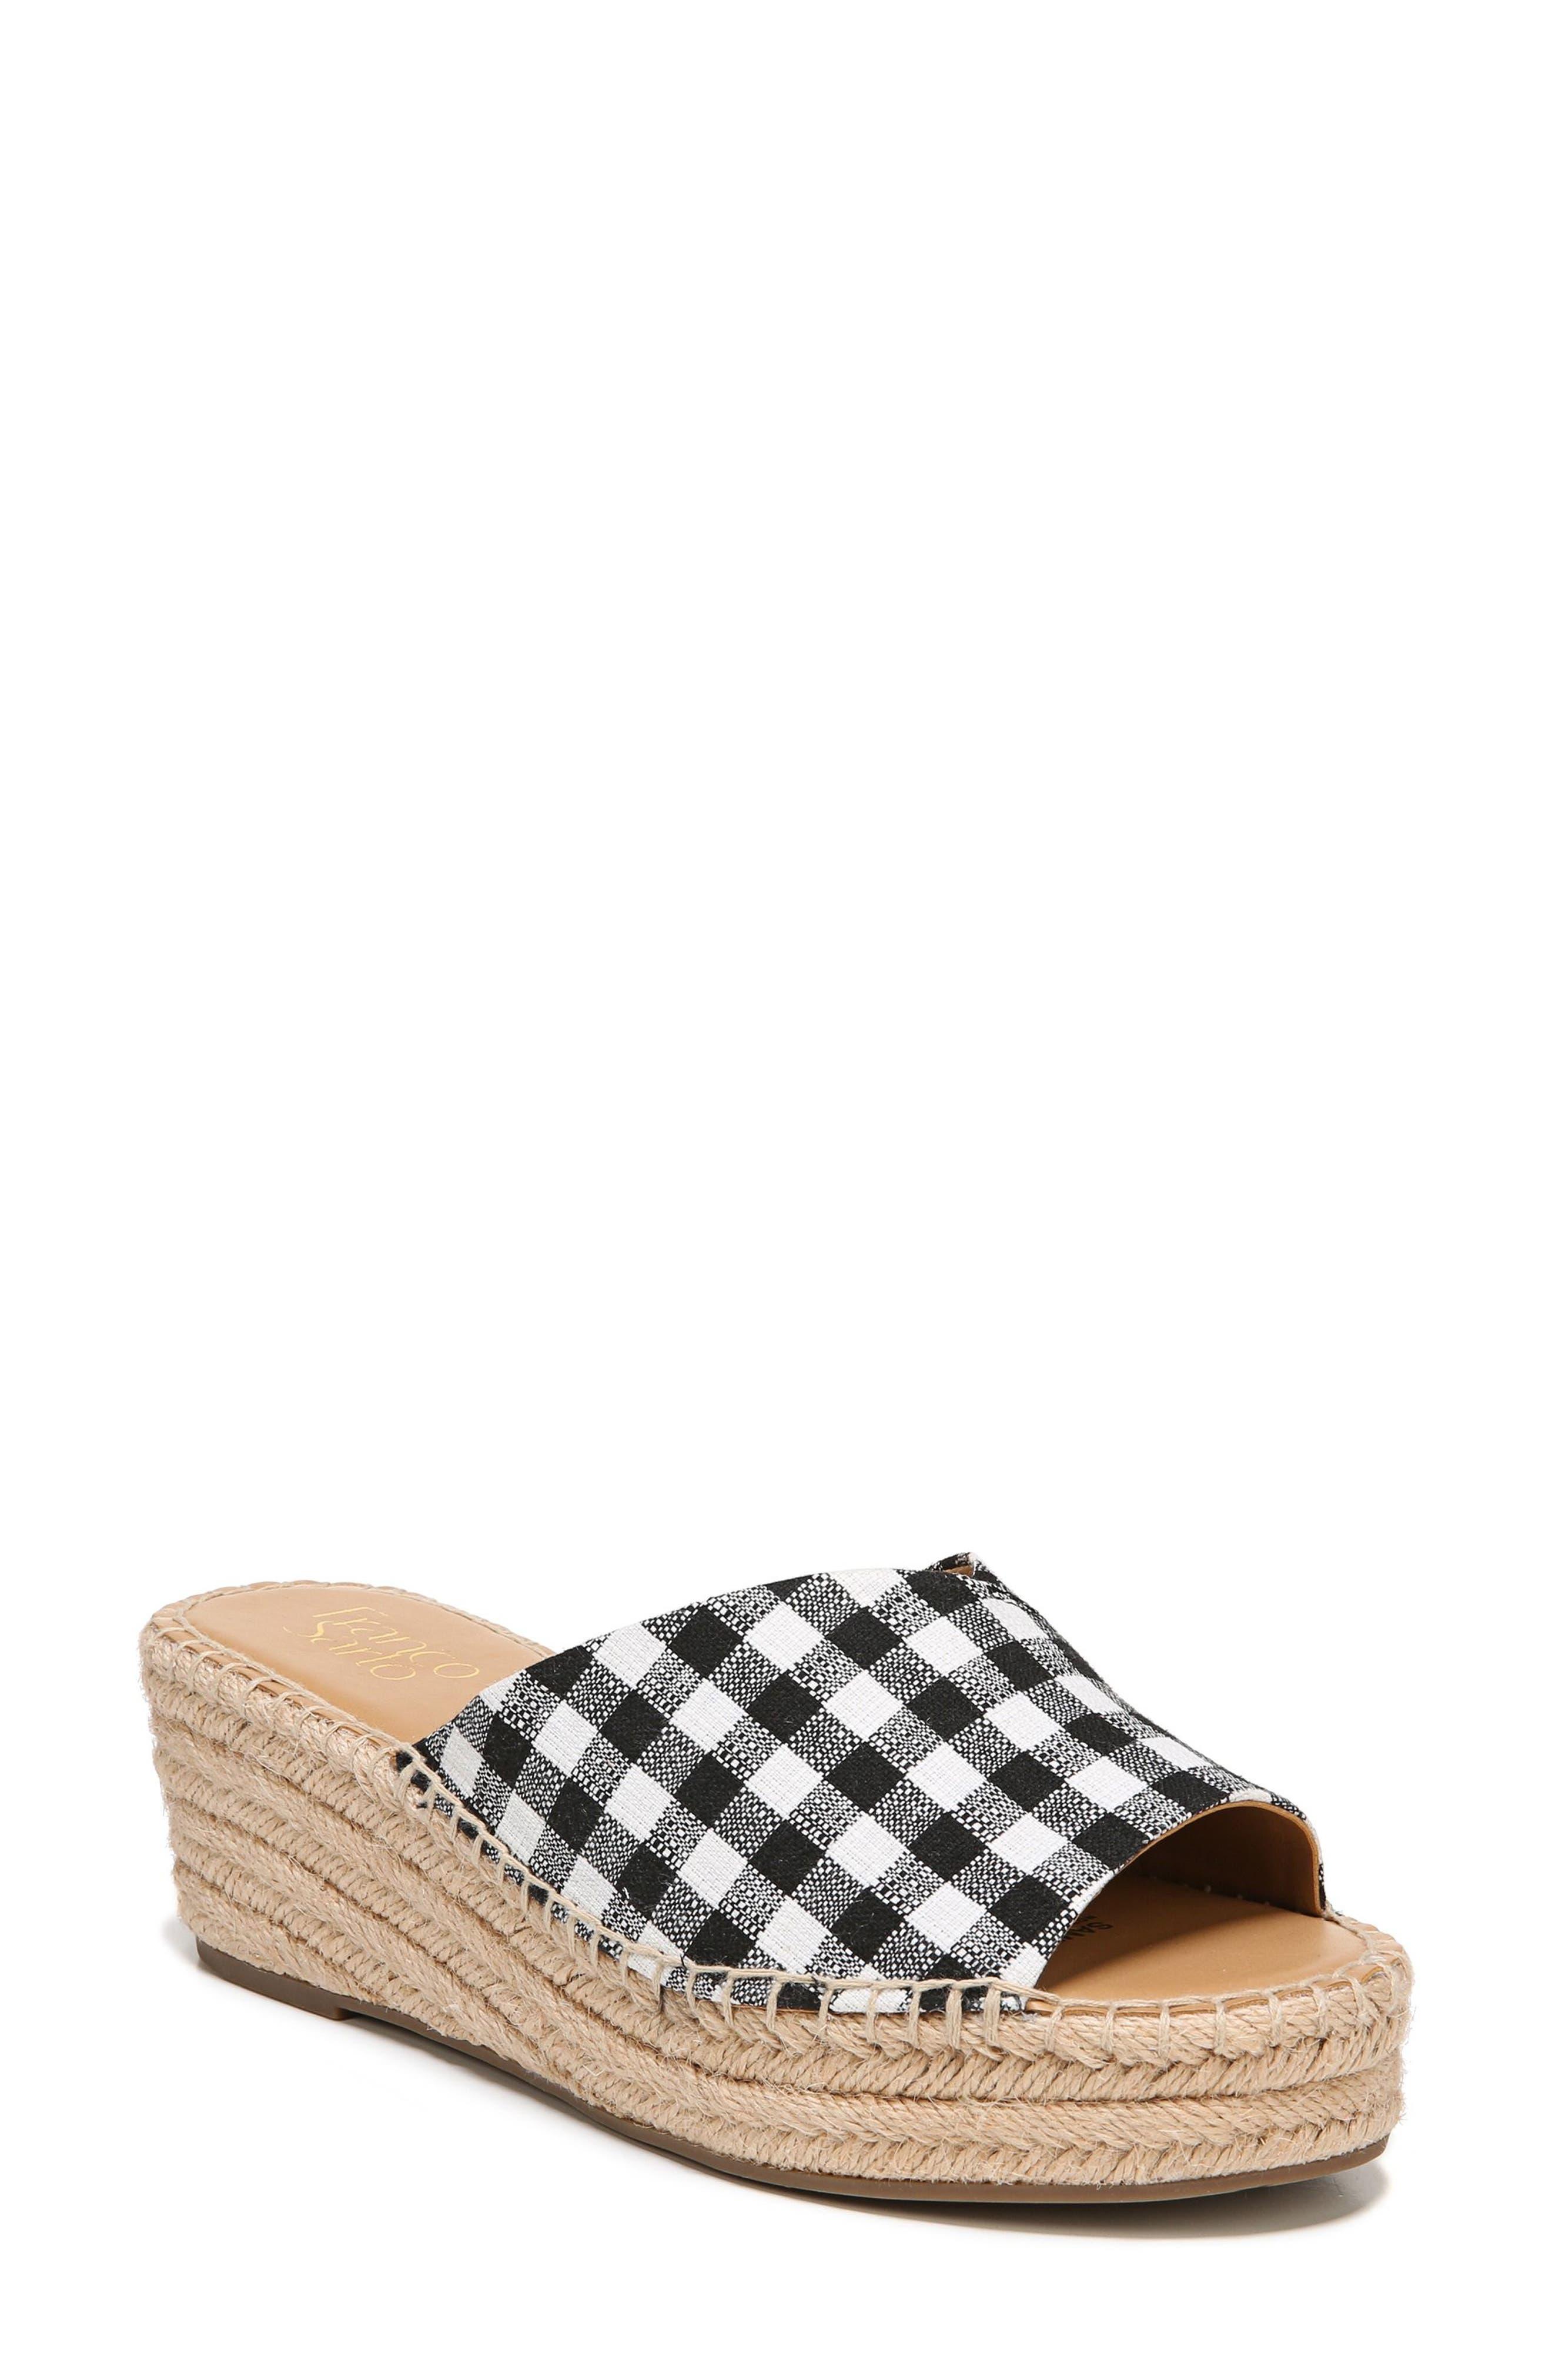 SARTO by Franco Sarto Pinot Platform Wedge Slide Sandal,                             Alternate thumbnail 7, color,                             BLACK/ WHITE